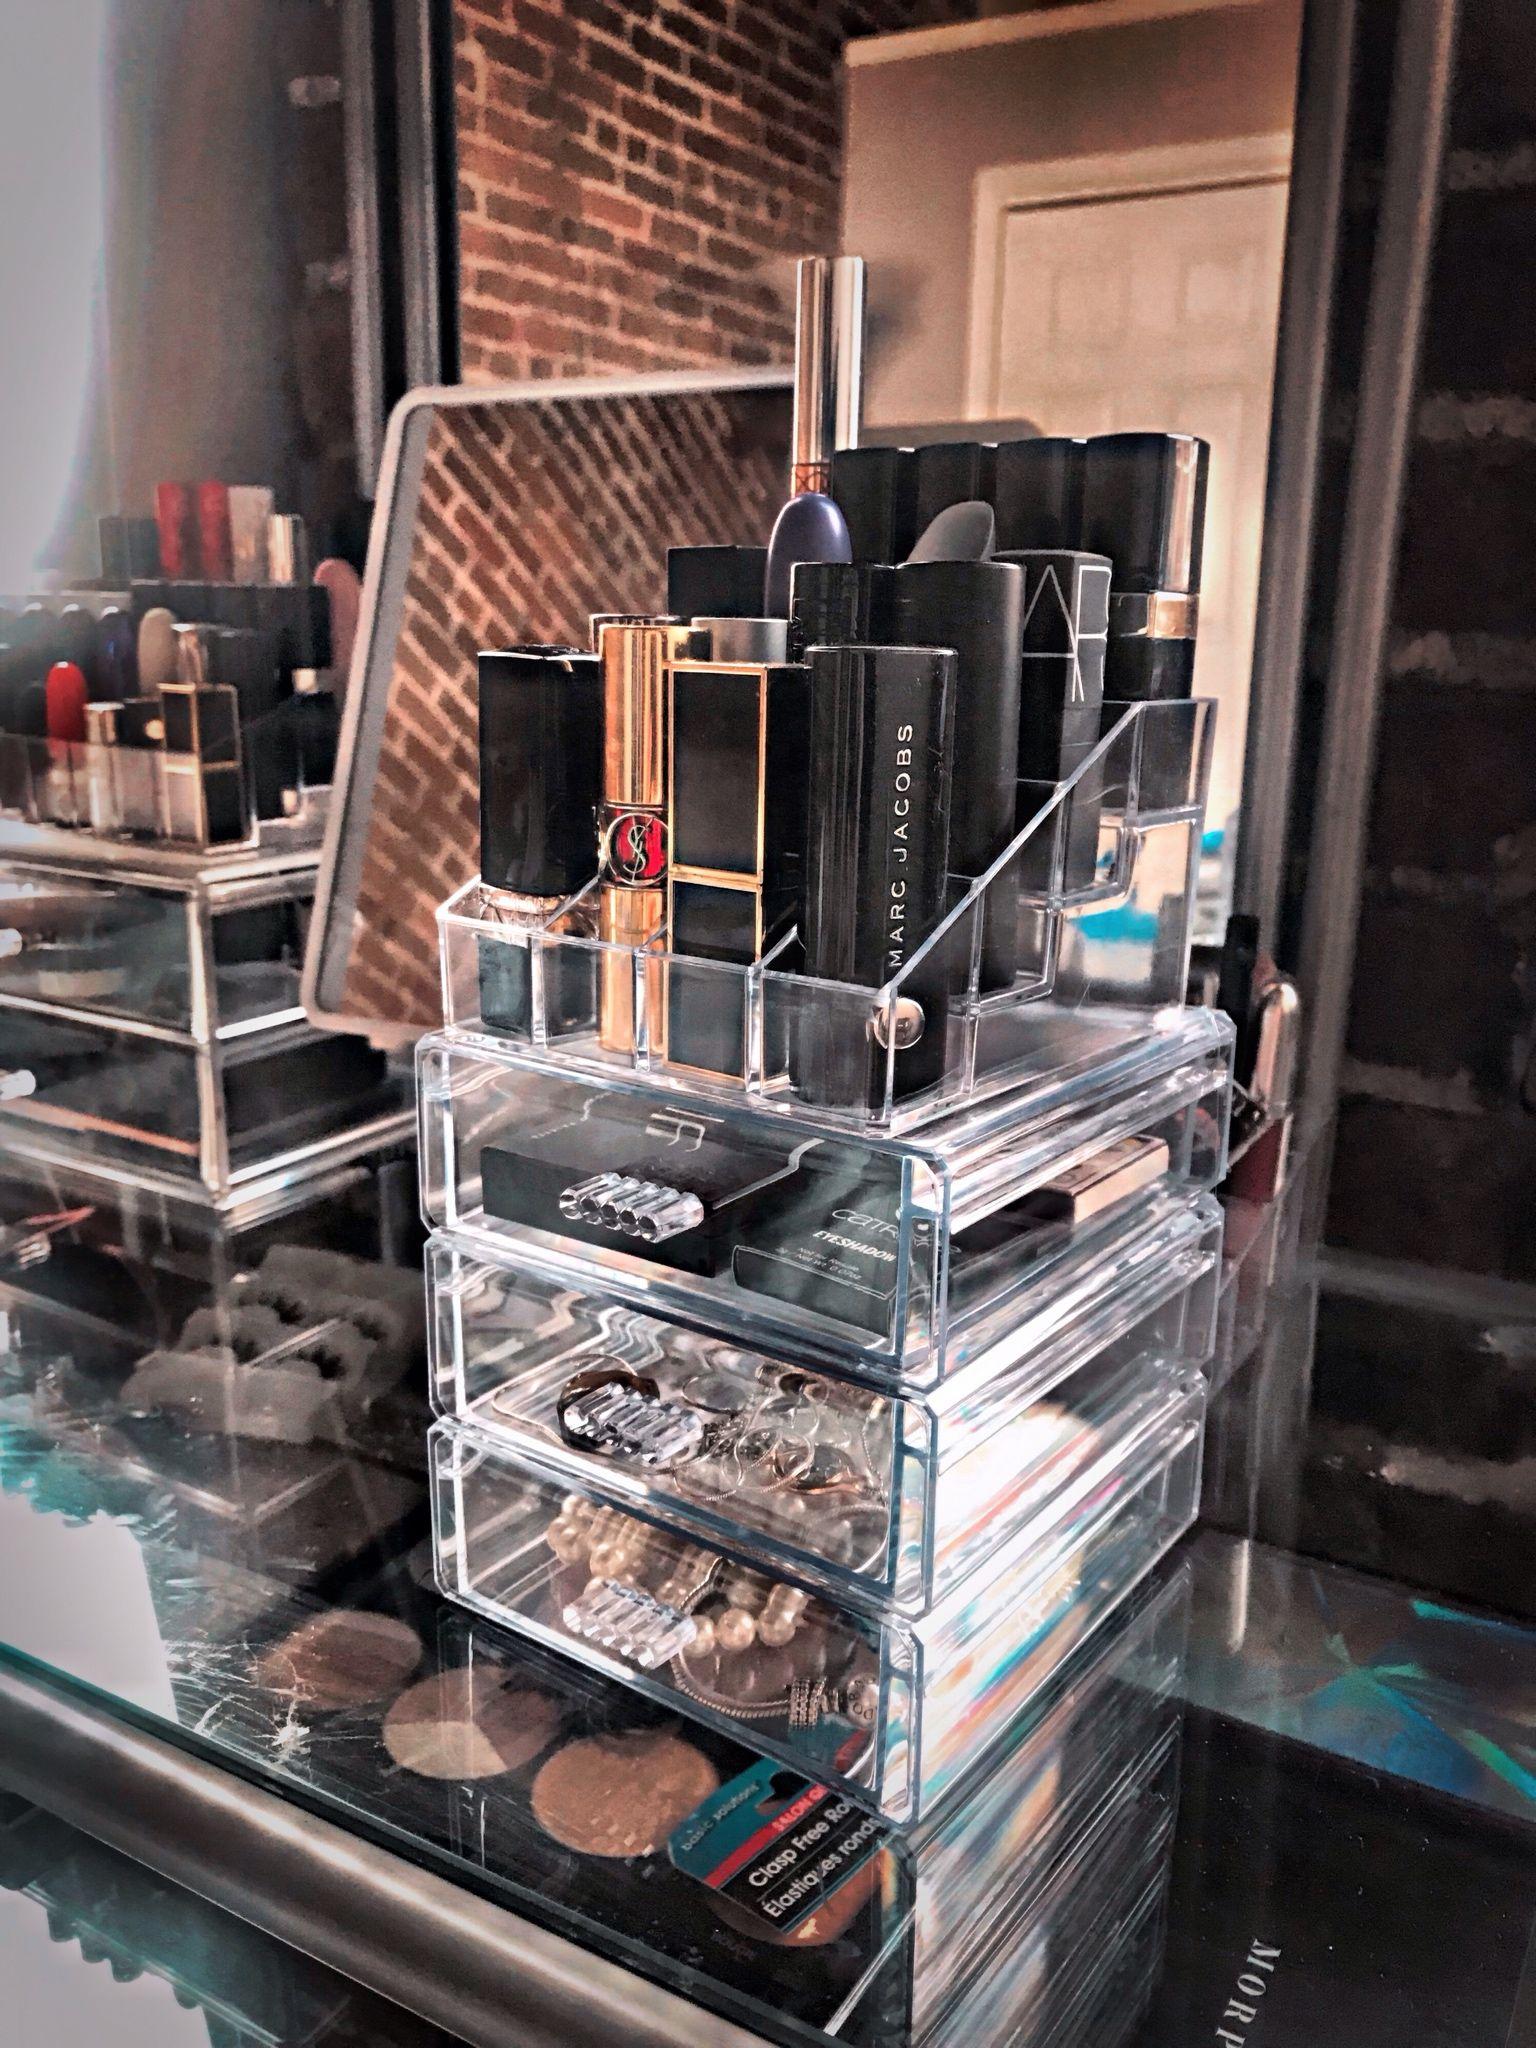 DIY 4 makeup organizer from Dollar Tree. (QuickCrafter